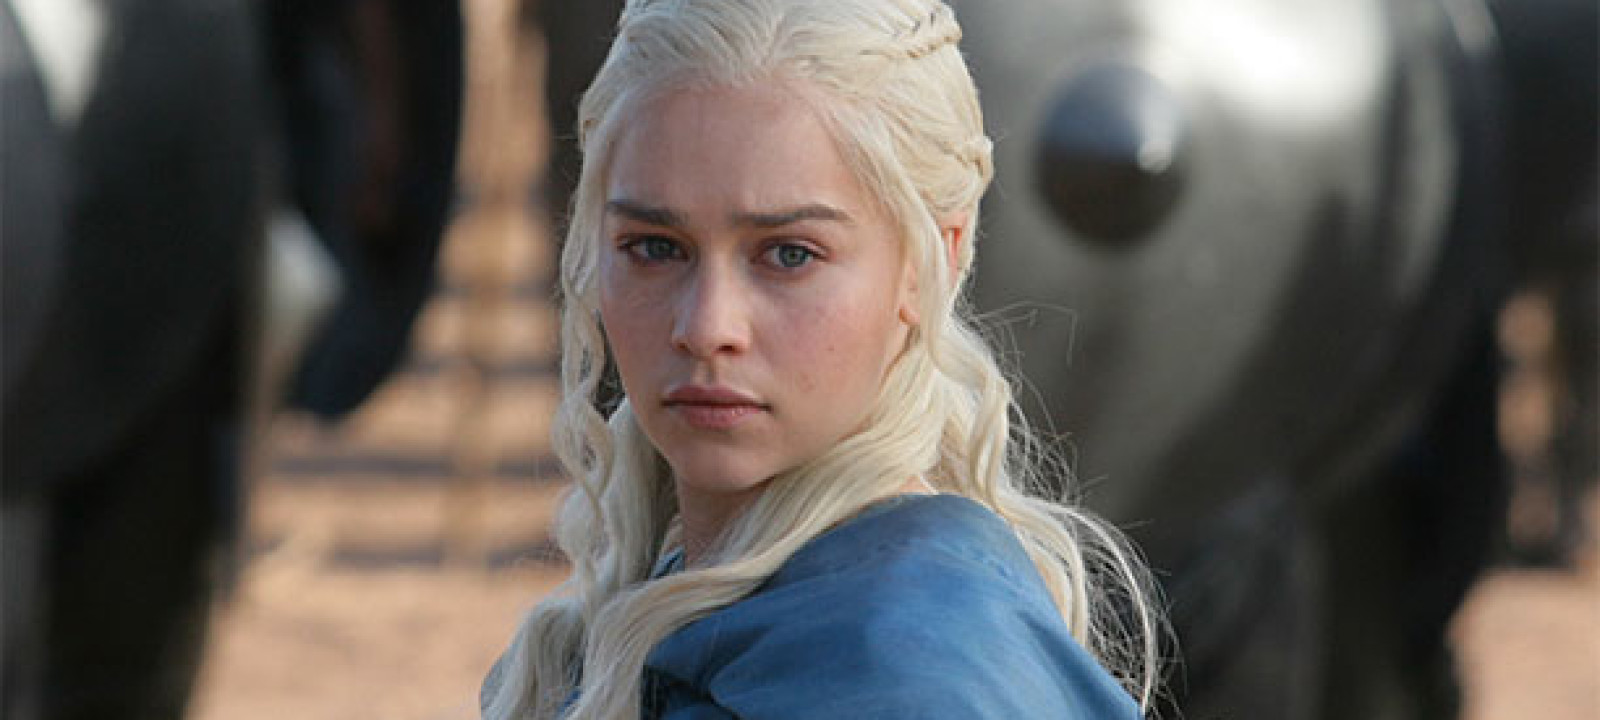 Emelia Clarke as Daenerys Targaryen in 'Game of Thrones' (Pic: HBO)